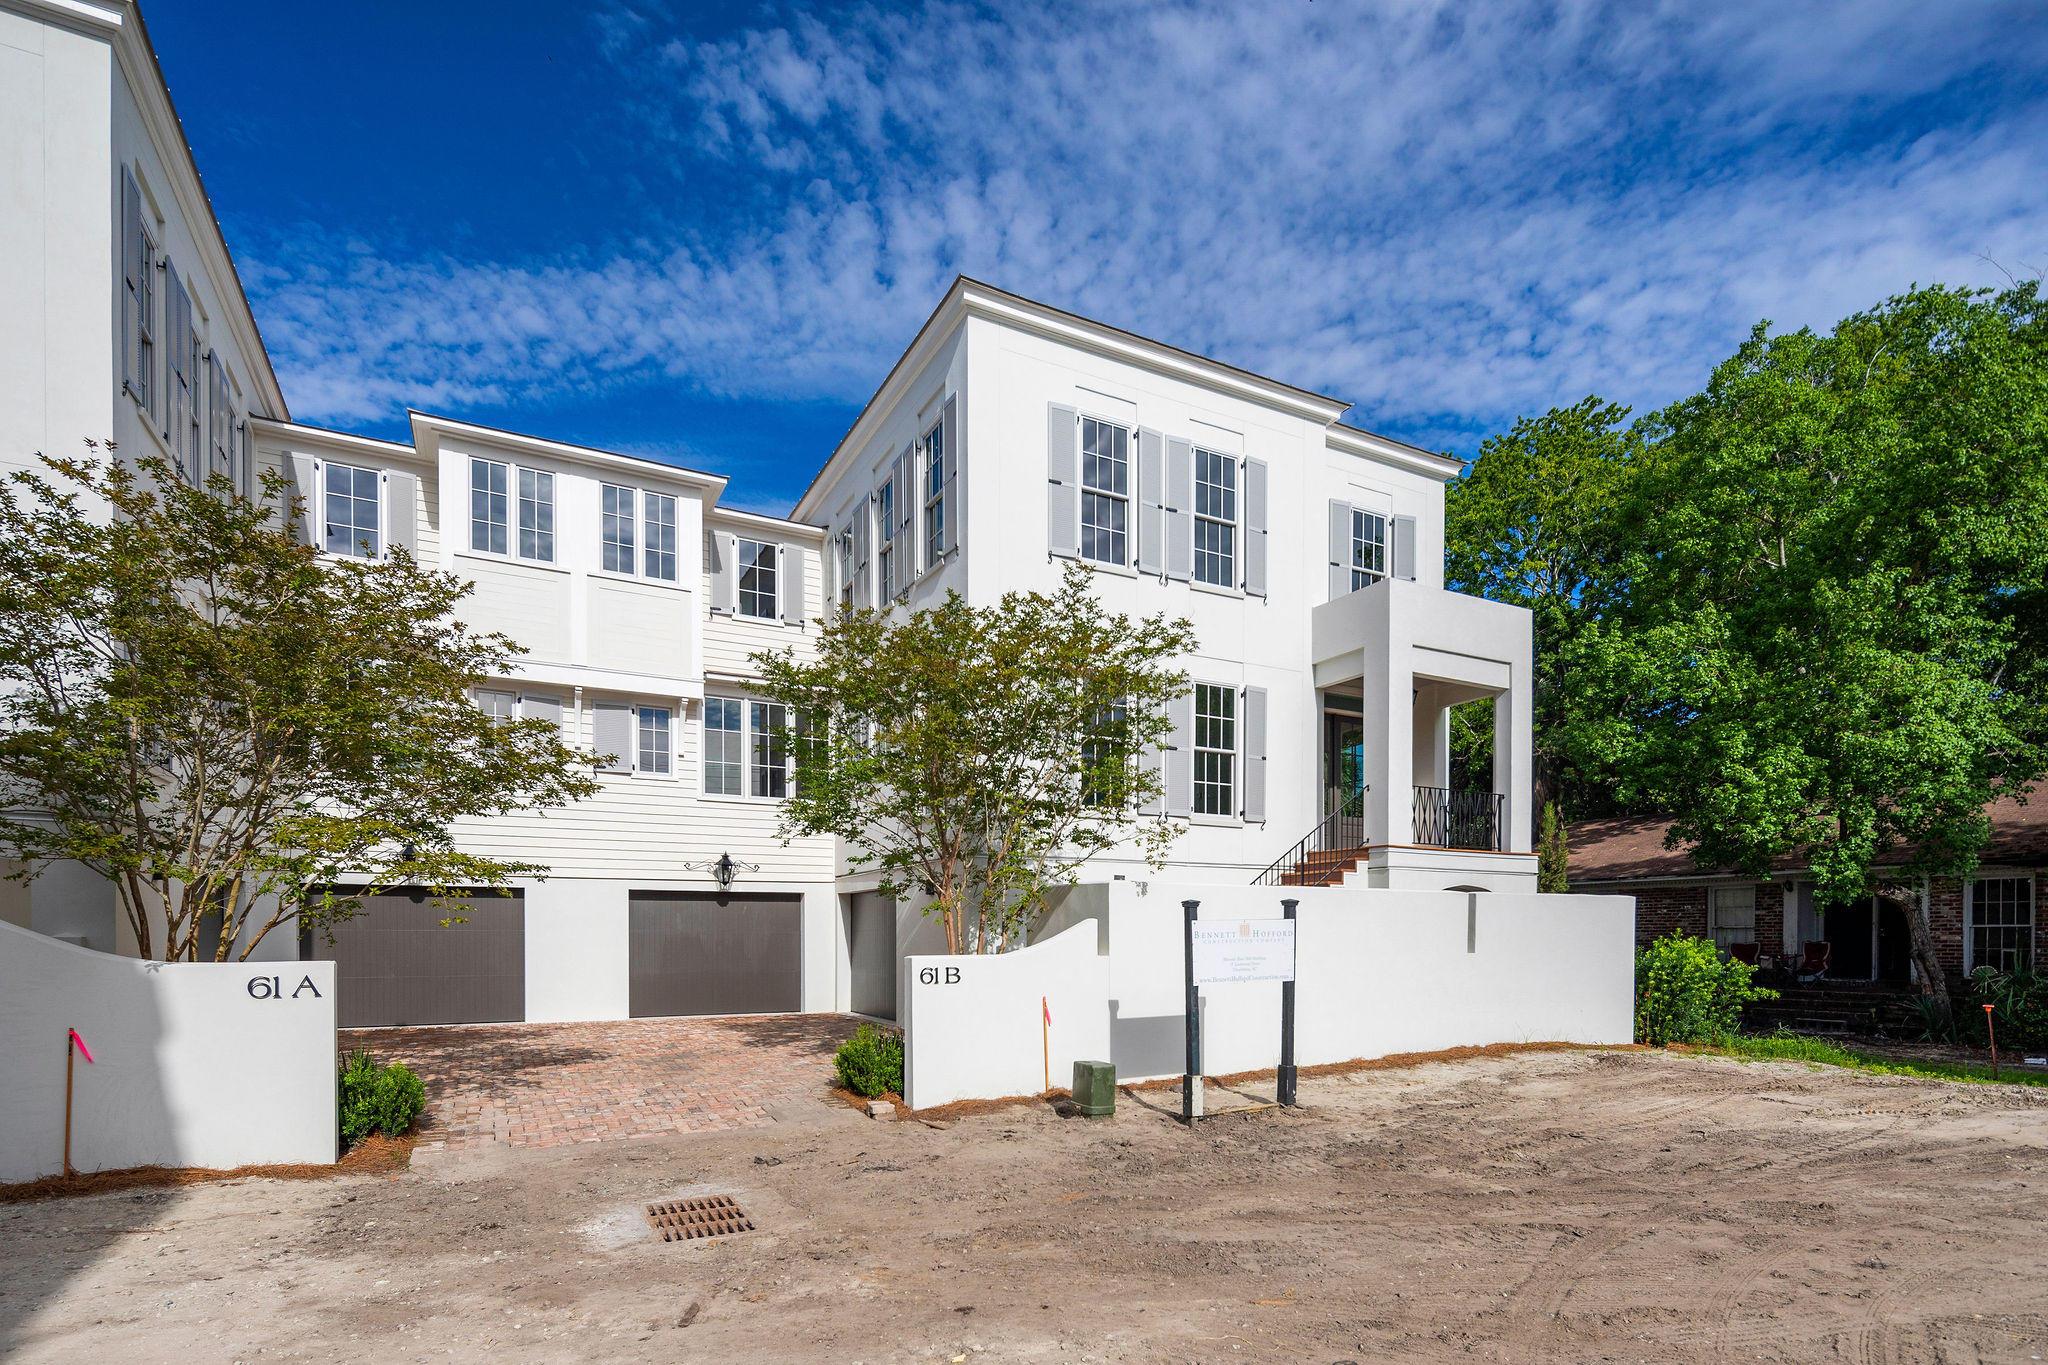 61 B Barre Street Charleston, SC 29401